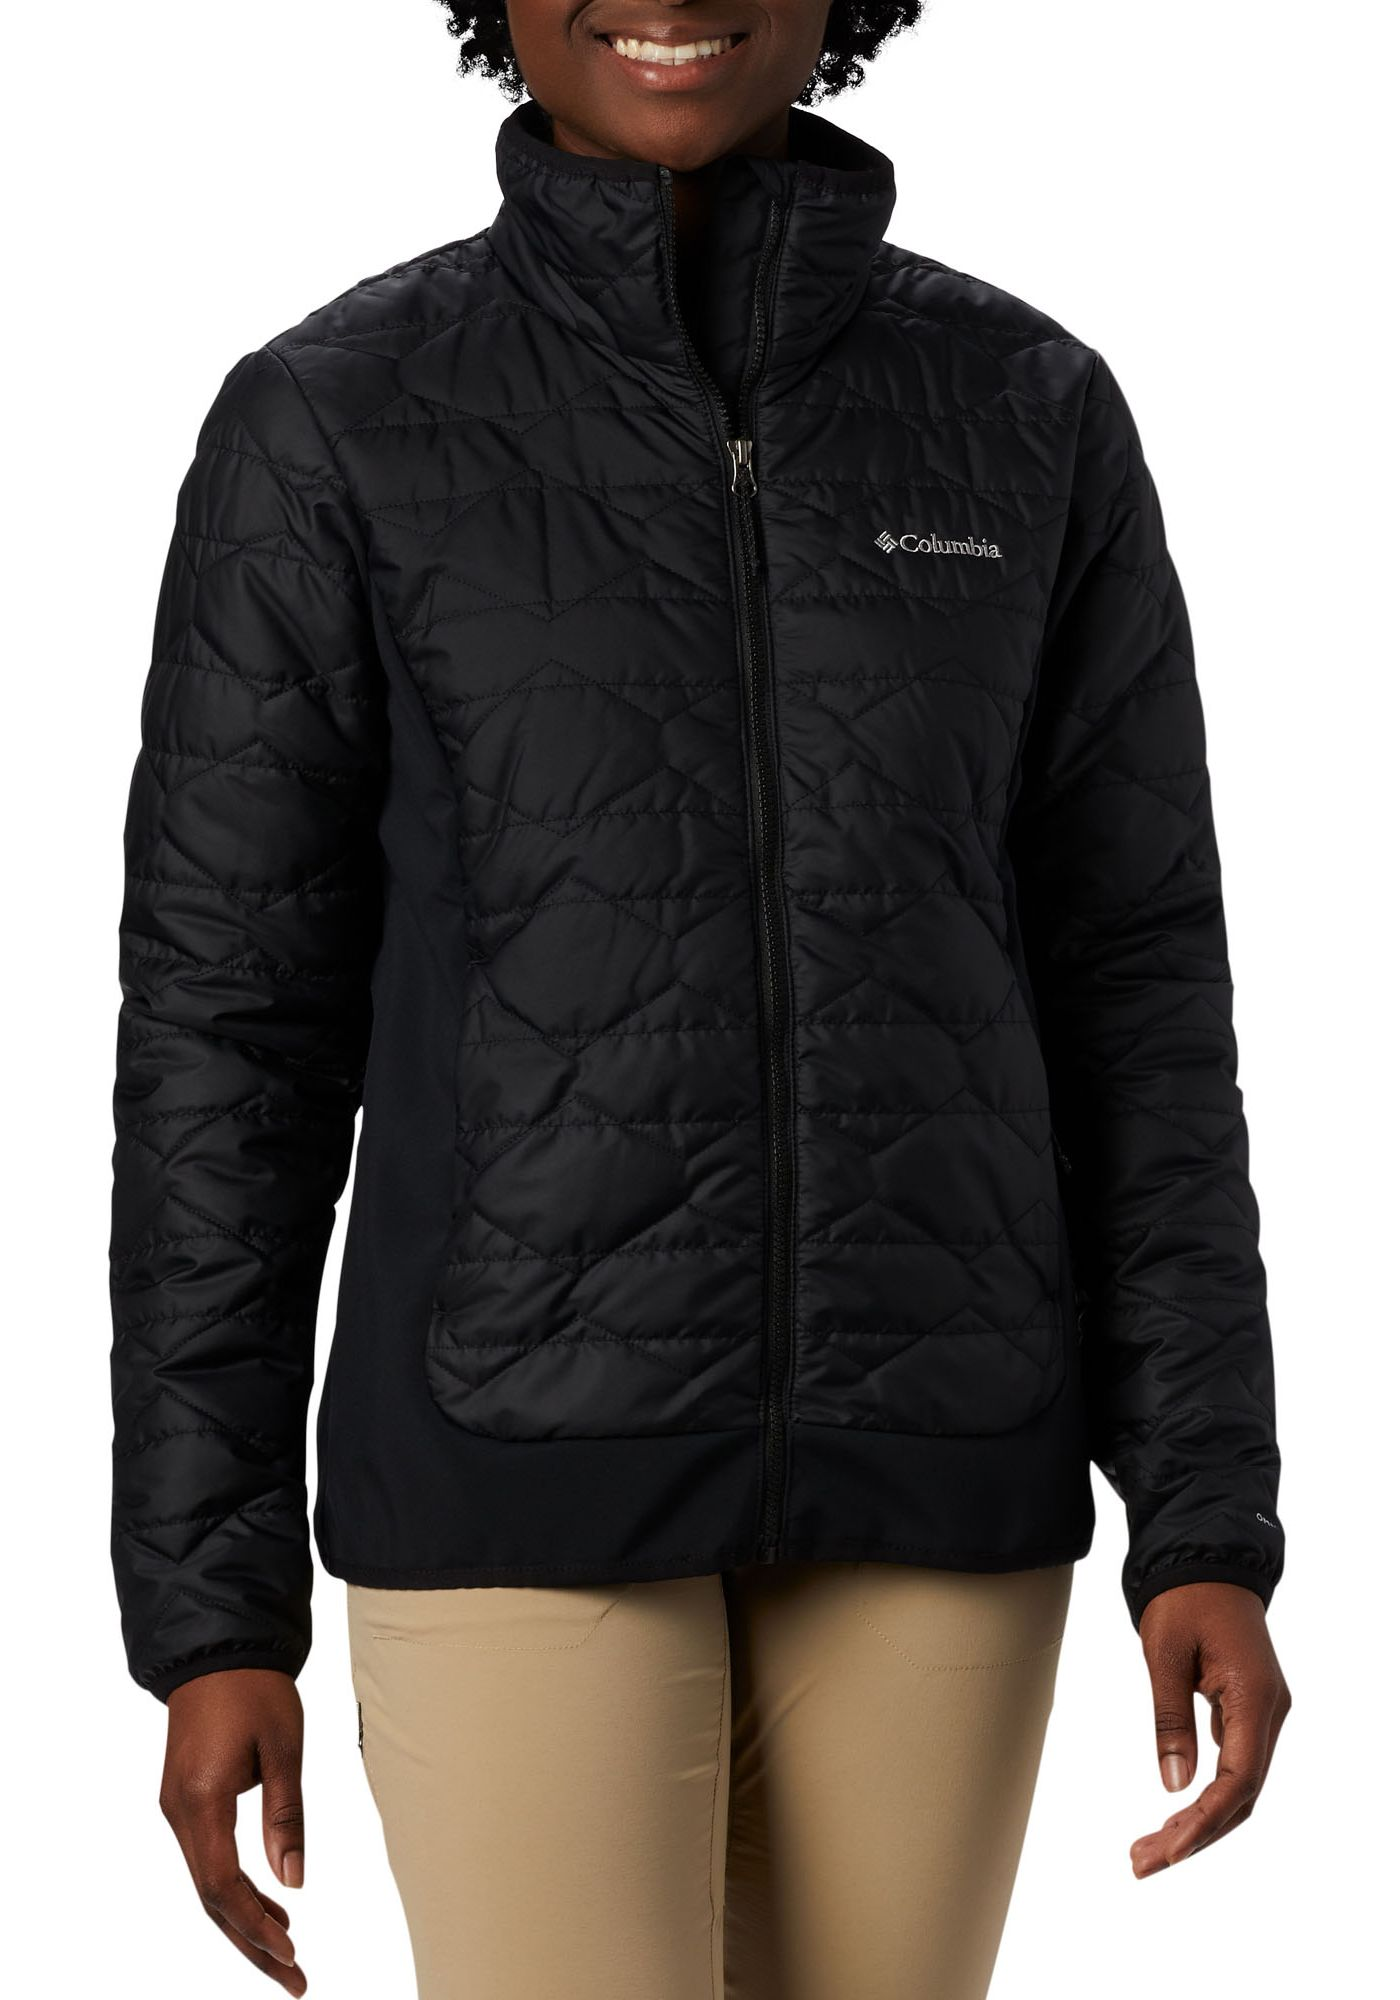 Columbia Women's Seneca Basin Hybrid Jacket